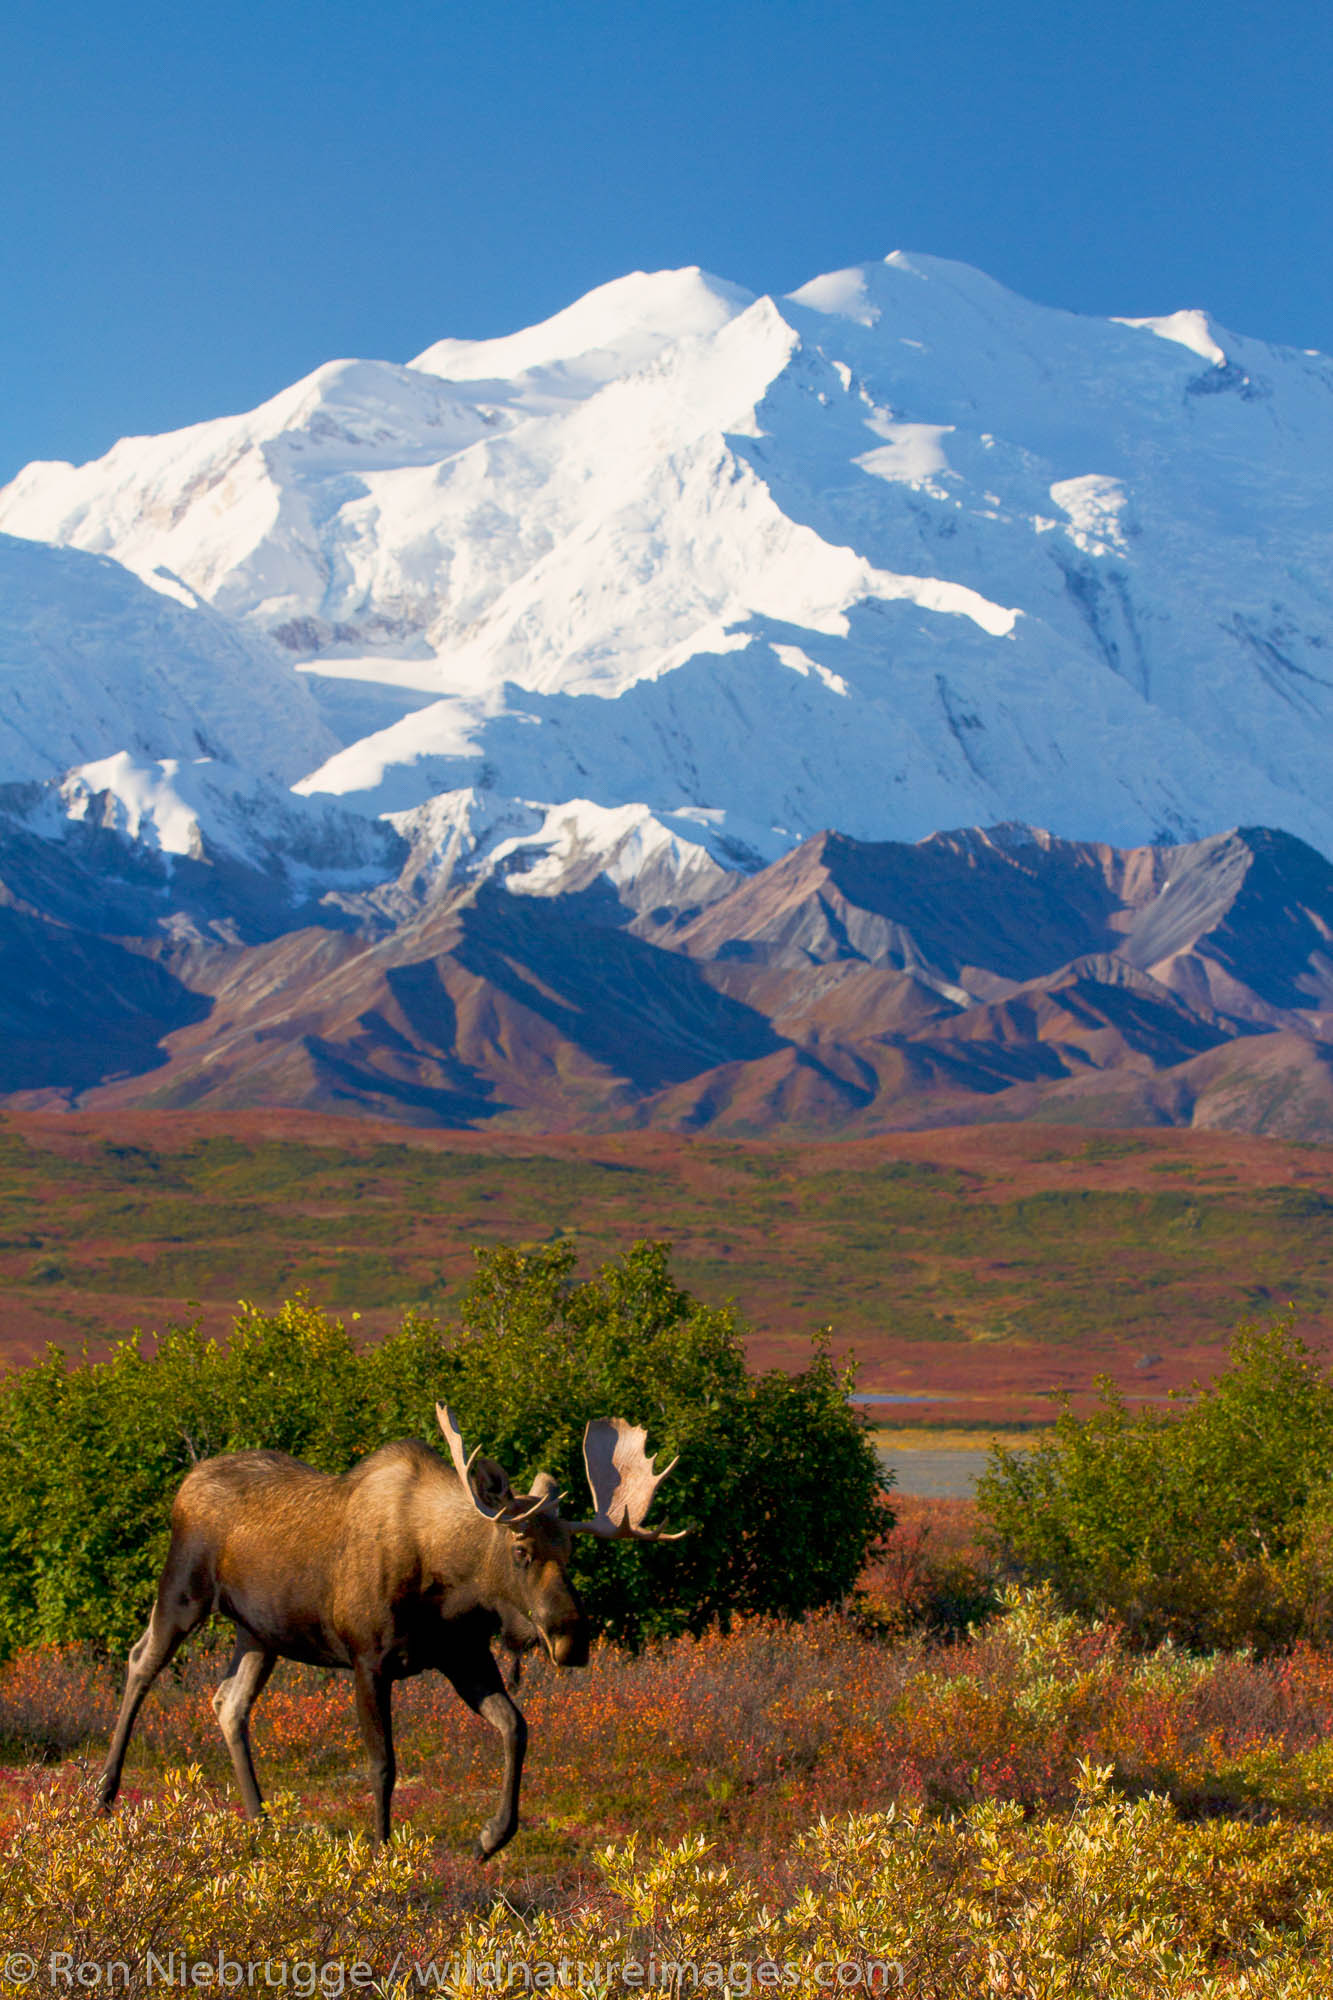 Bull moose in front of Mt McKinley, also called Denali, Denali National Park, Alaska.